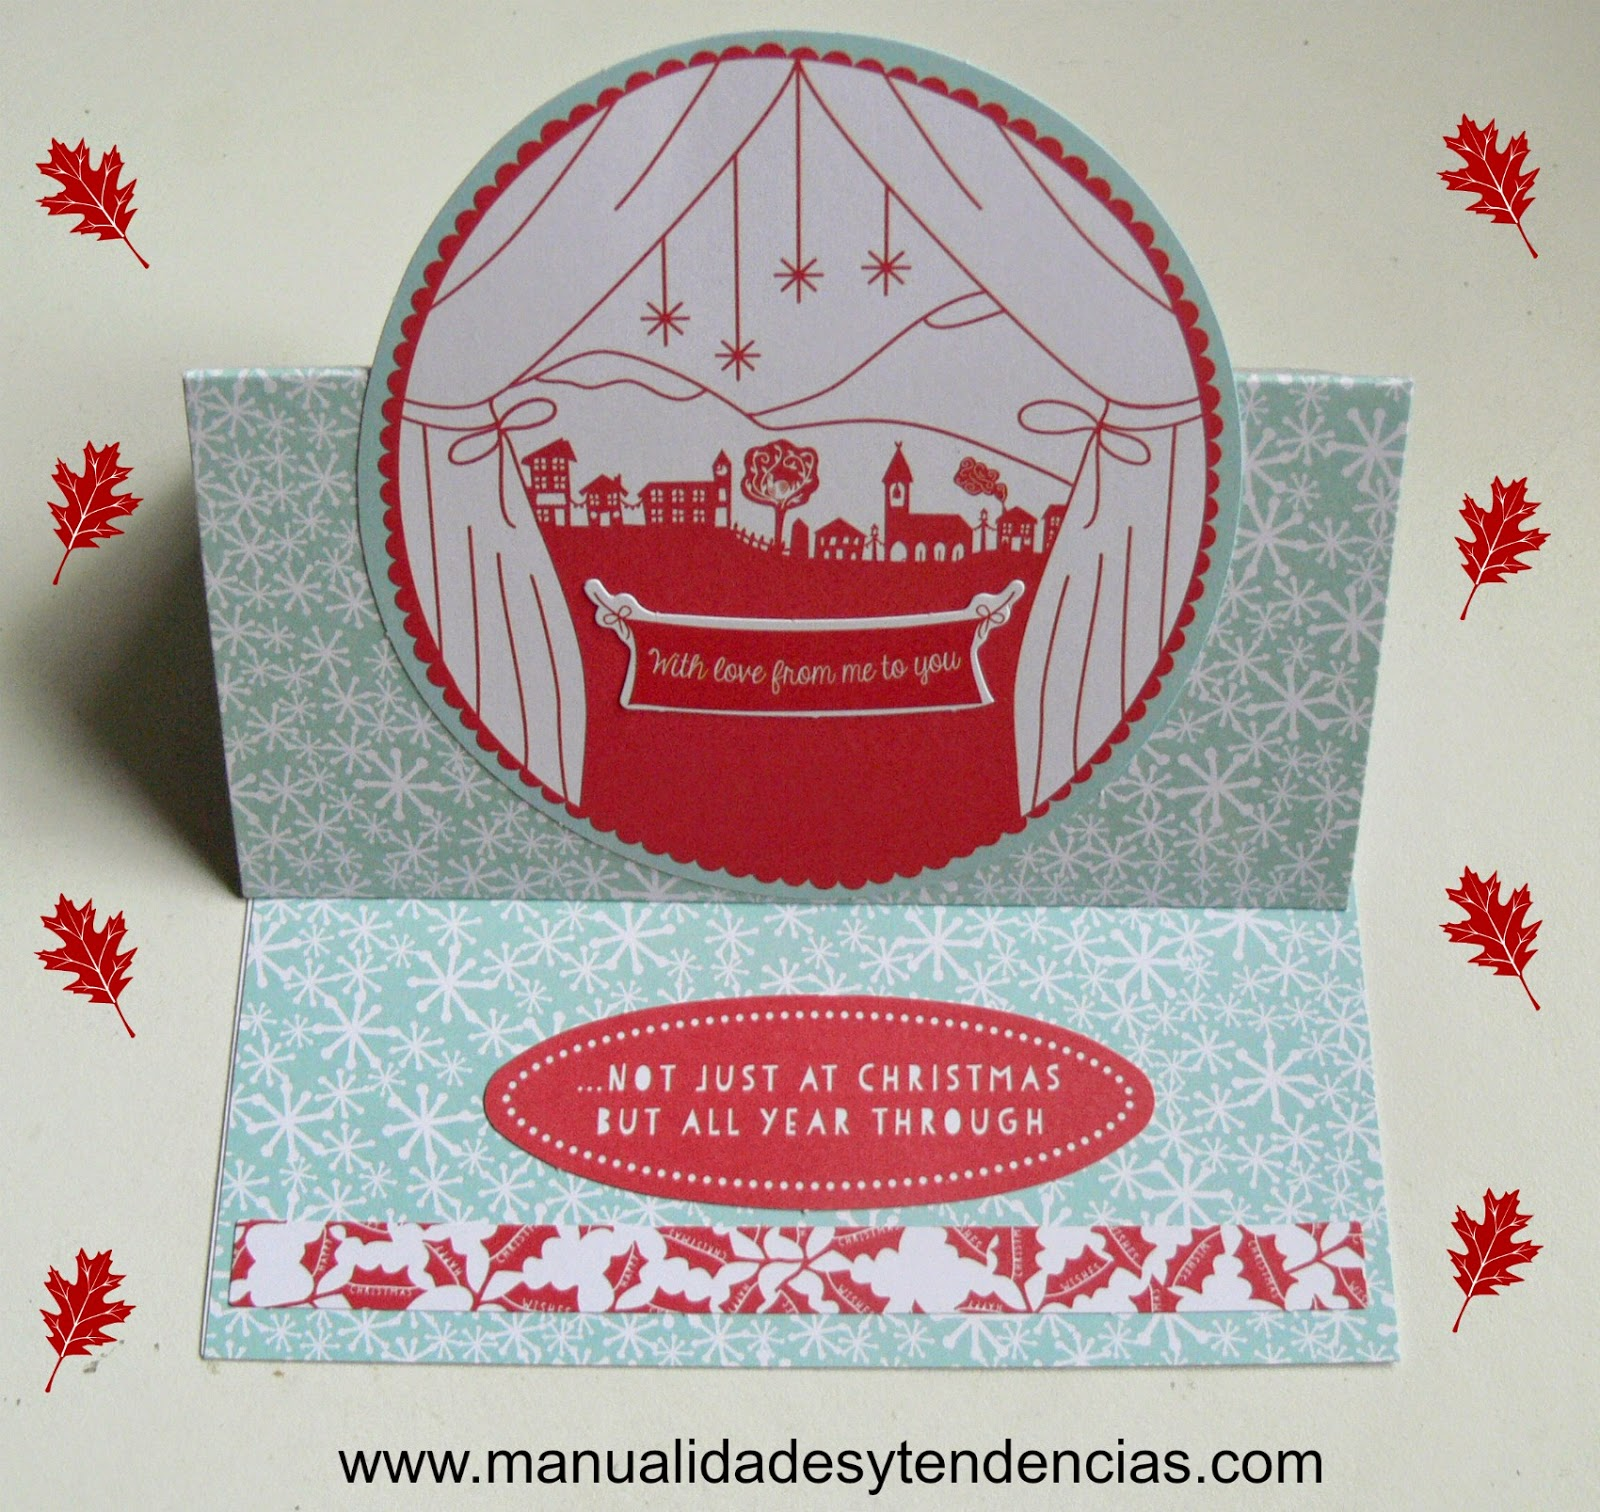 Tarjeta navideña 3D / 3 D Christmas card